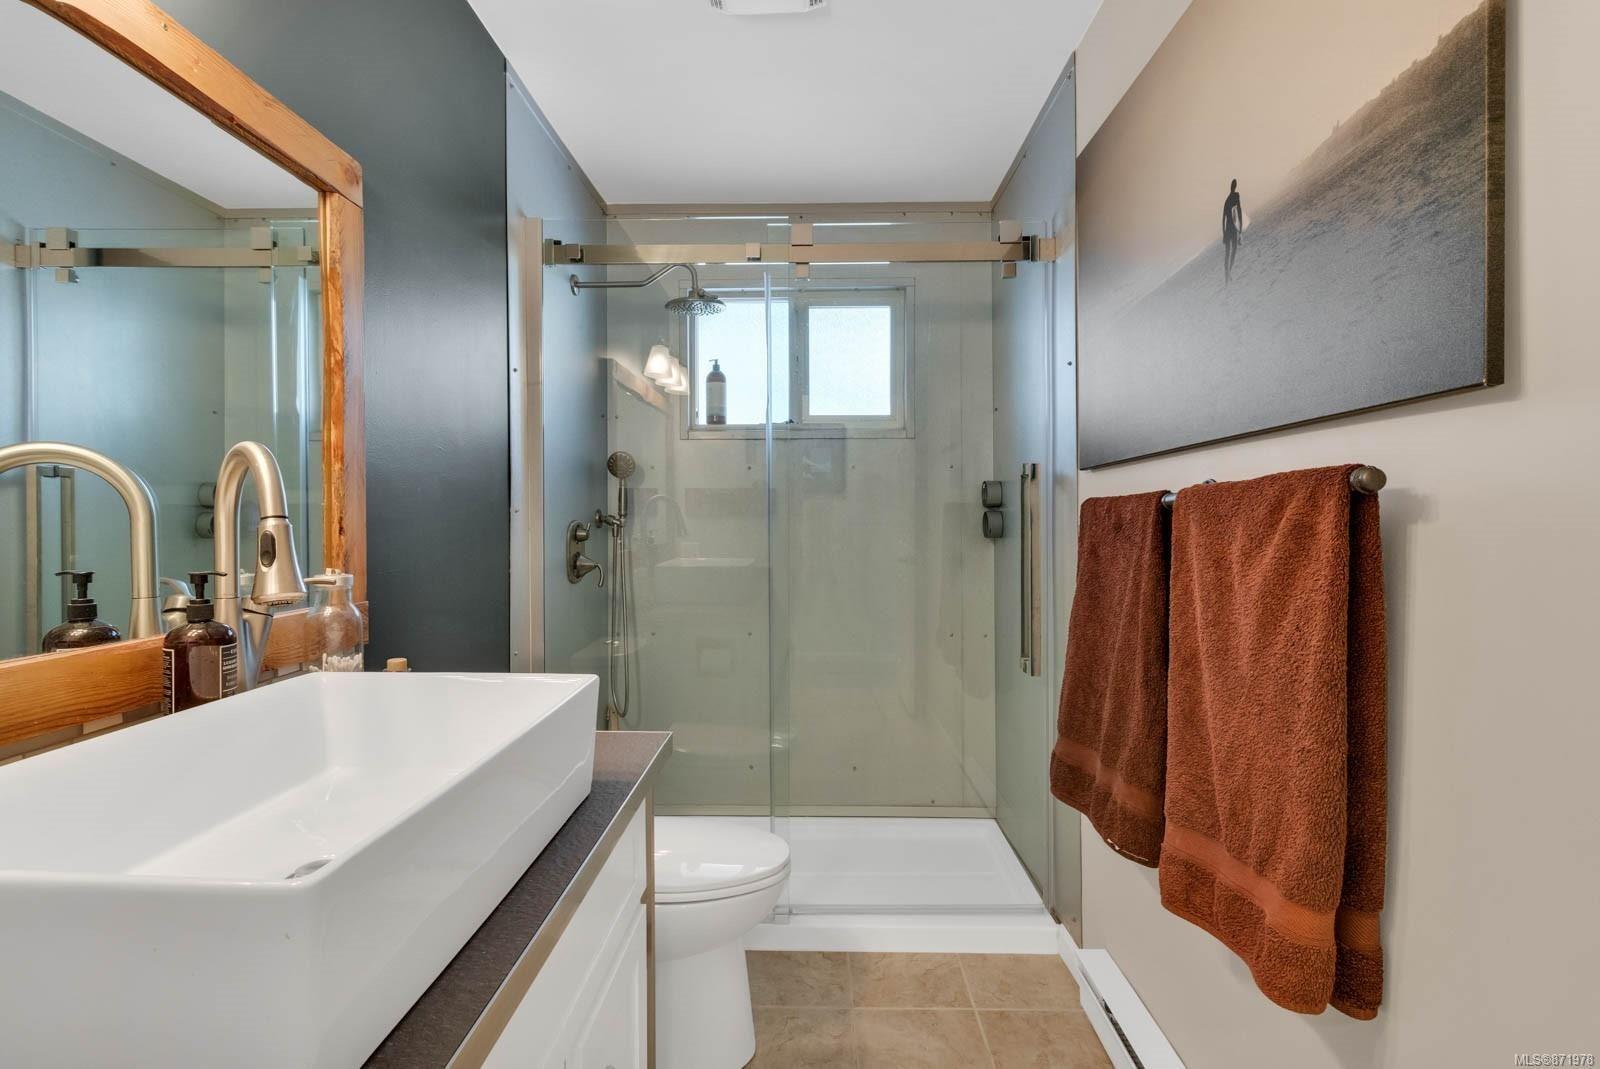 Photo 21: Photos: 1539 Chilcotin Cres in : CV Comox (Town of) House for sale (Comox Valley)  : MLS®# 871978